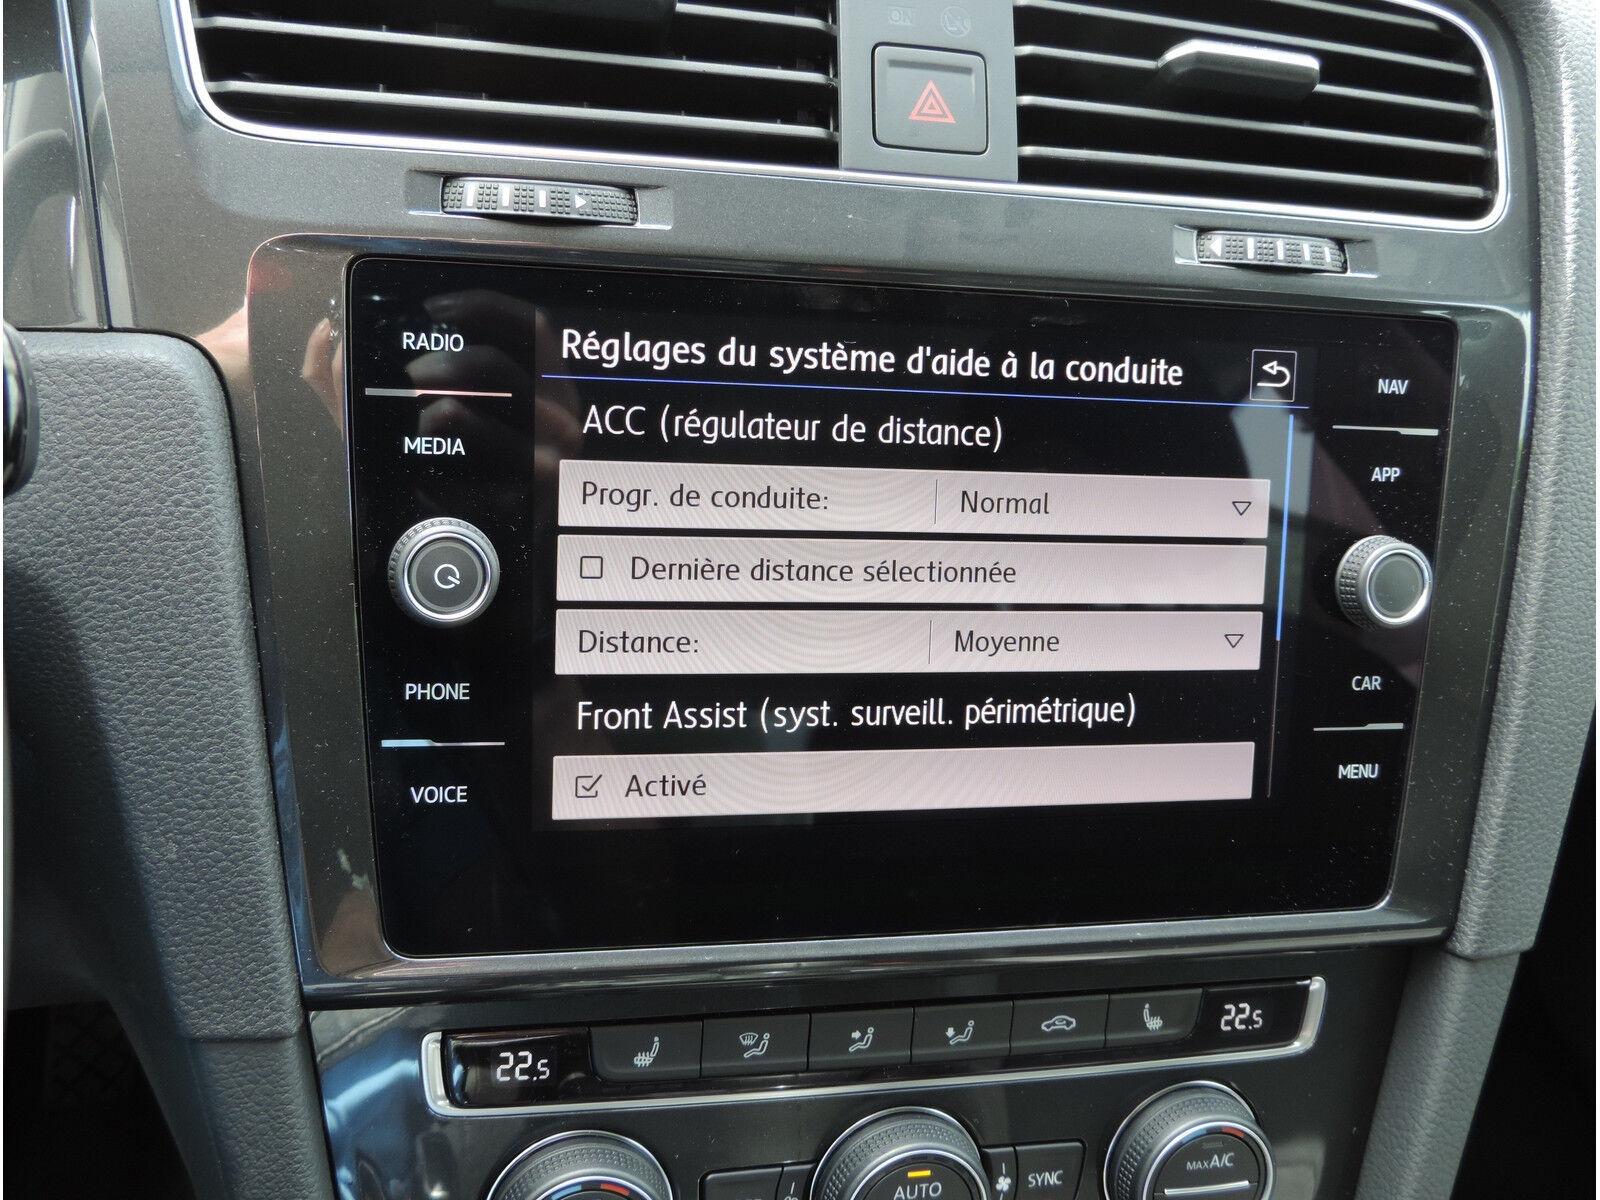 Volkswagen Golf 1.6 TDI R-LINE CLIMA REGUL ACC GPS LED NEUVE 11/15